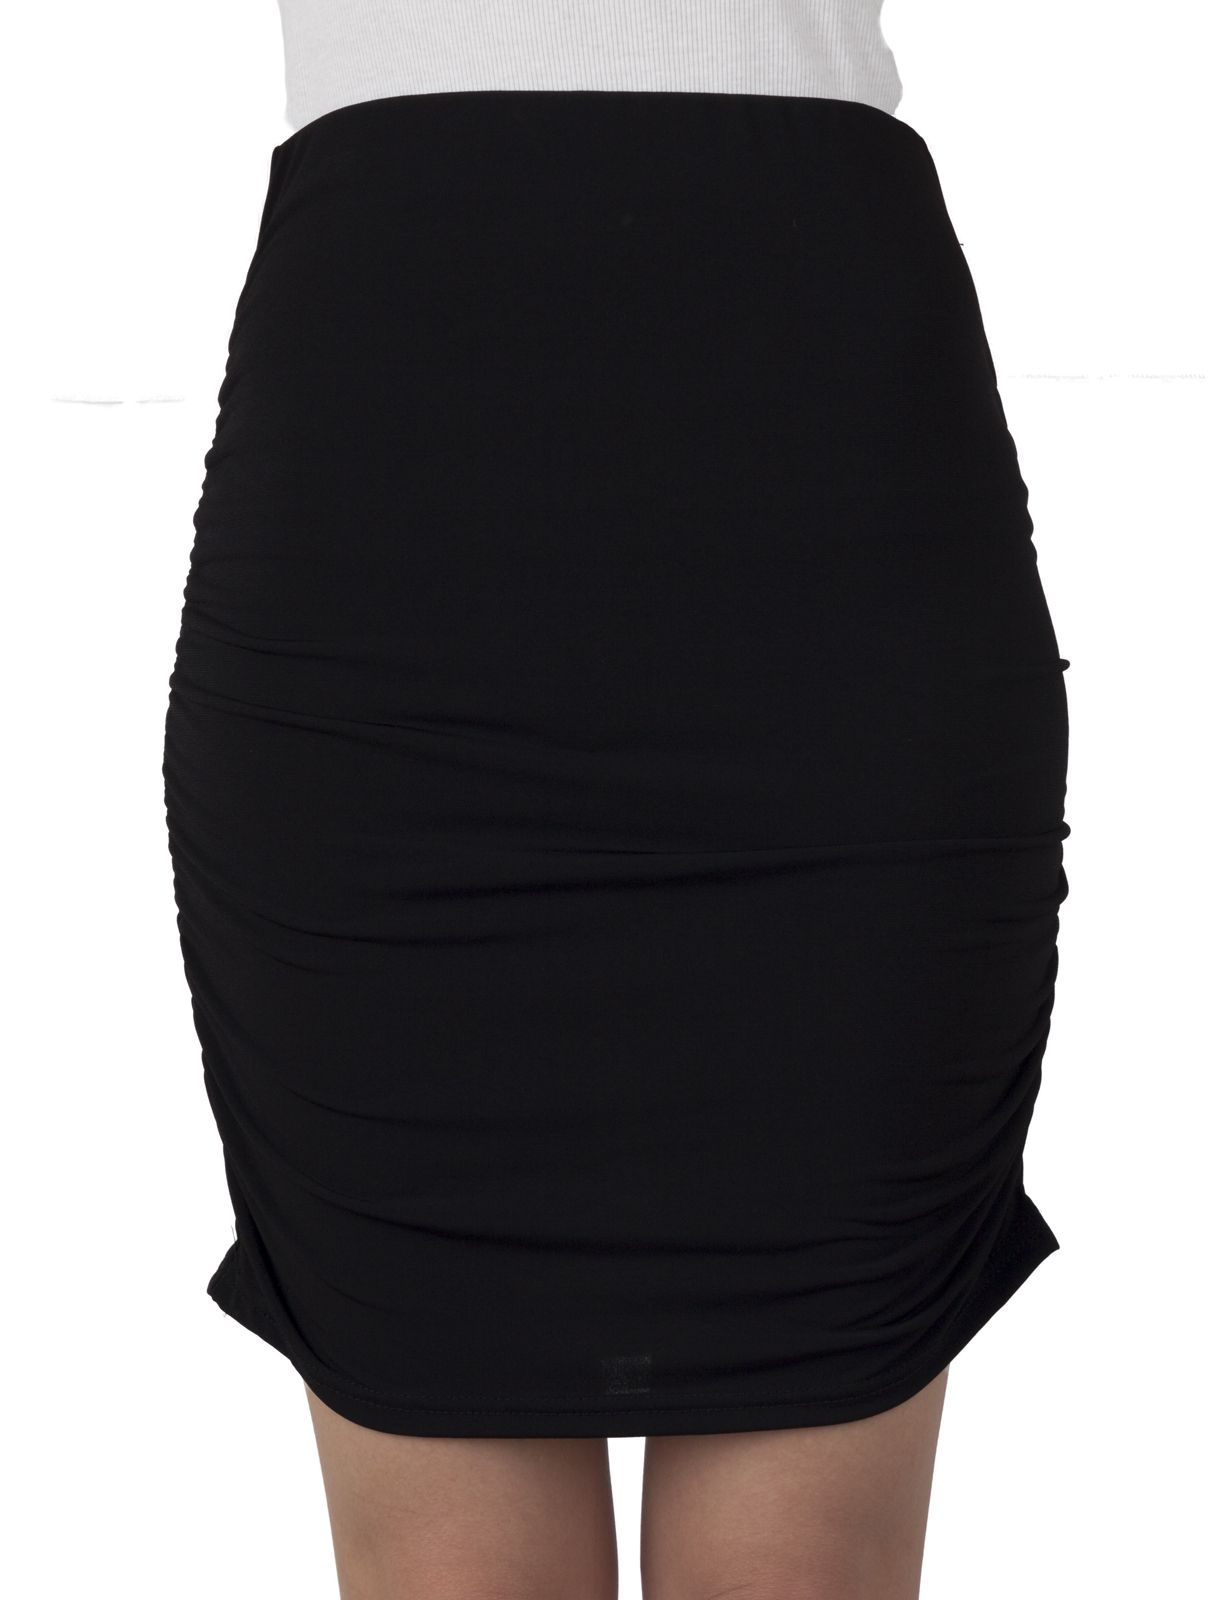 PorStyle Women Shirring Span Pencil Skirt http://porstyle.com http://www.amazon.com/PorStyle-Women-Shirring-Pencil-Skirt/dp/B00EU6O2BI/ref=sr_1_5?s=apparel=UTF8=1377830405=1-5=porstyle